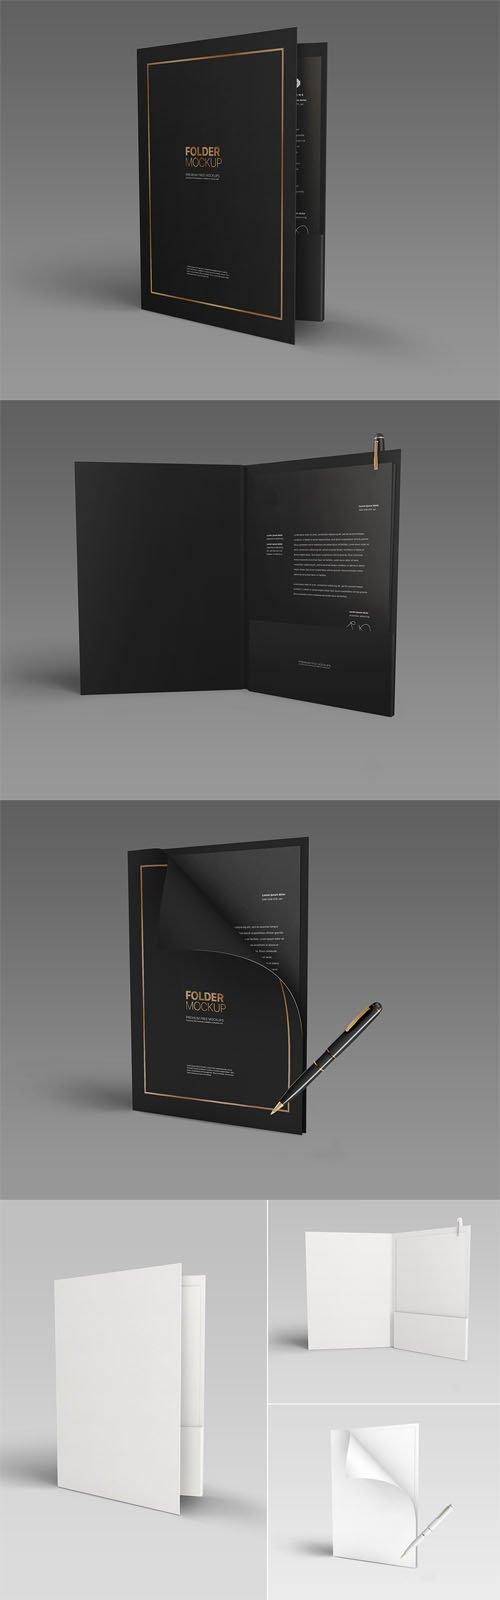 Pocket Folder PSD Mockup Templates